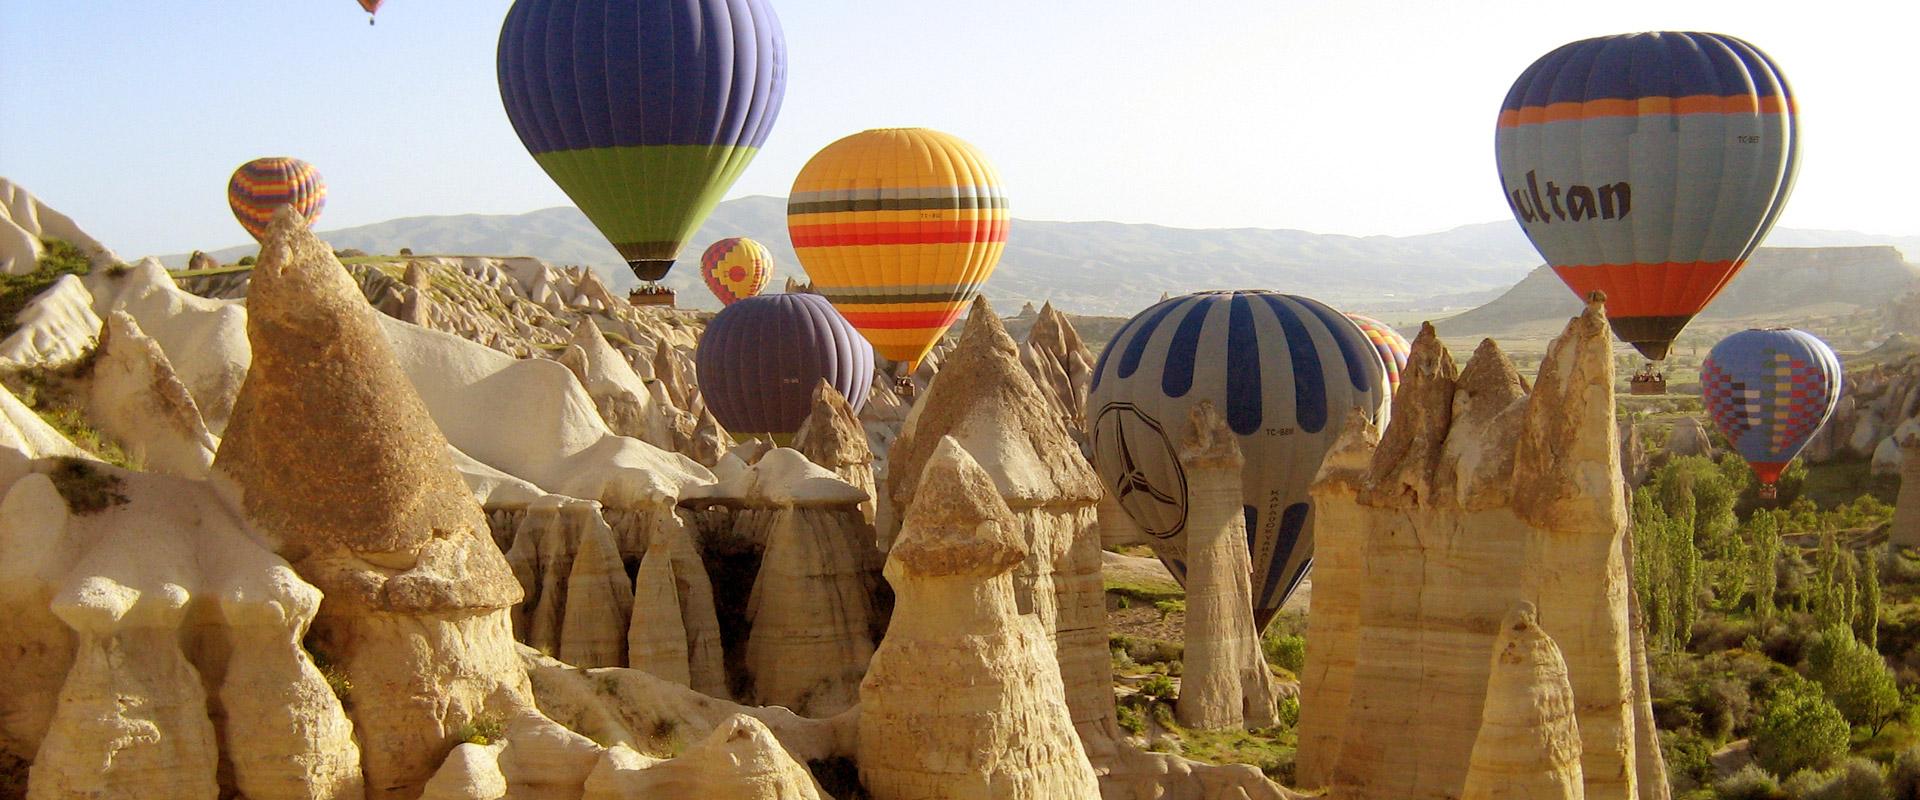 kapadokija obilazak balonom